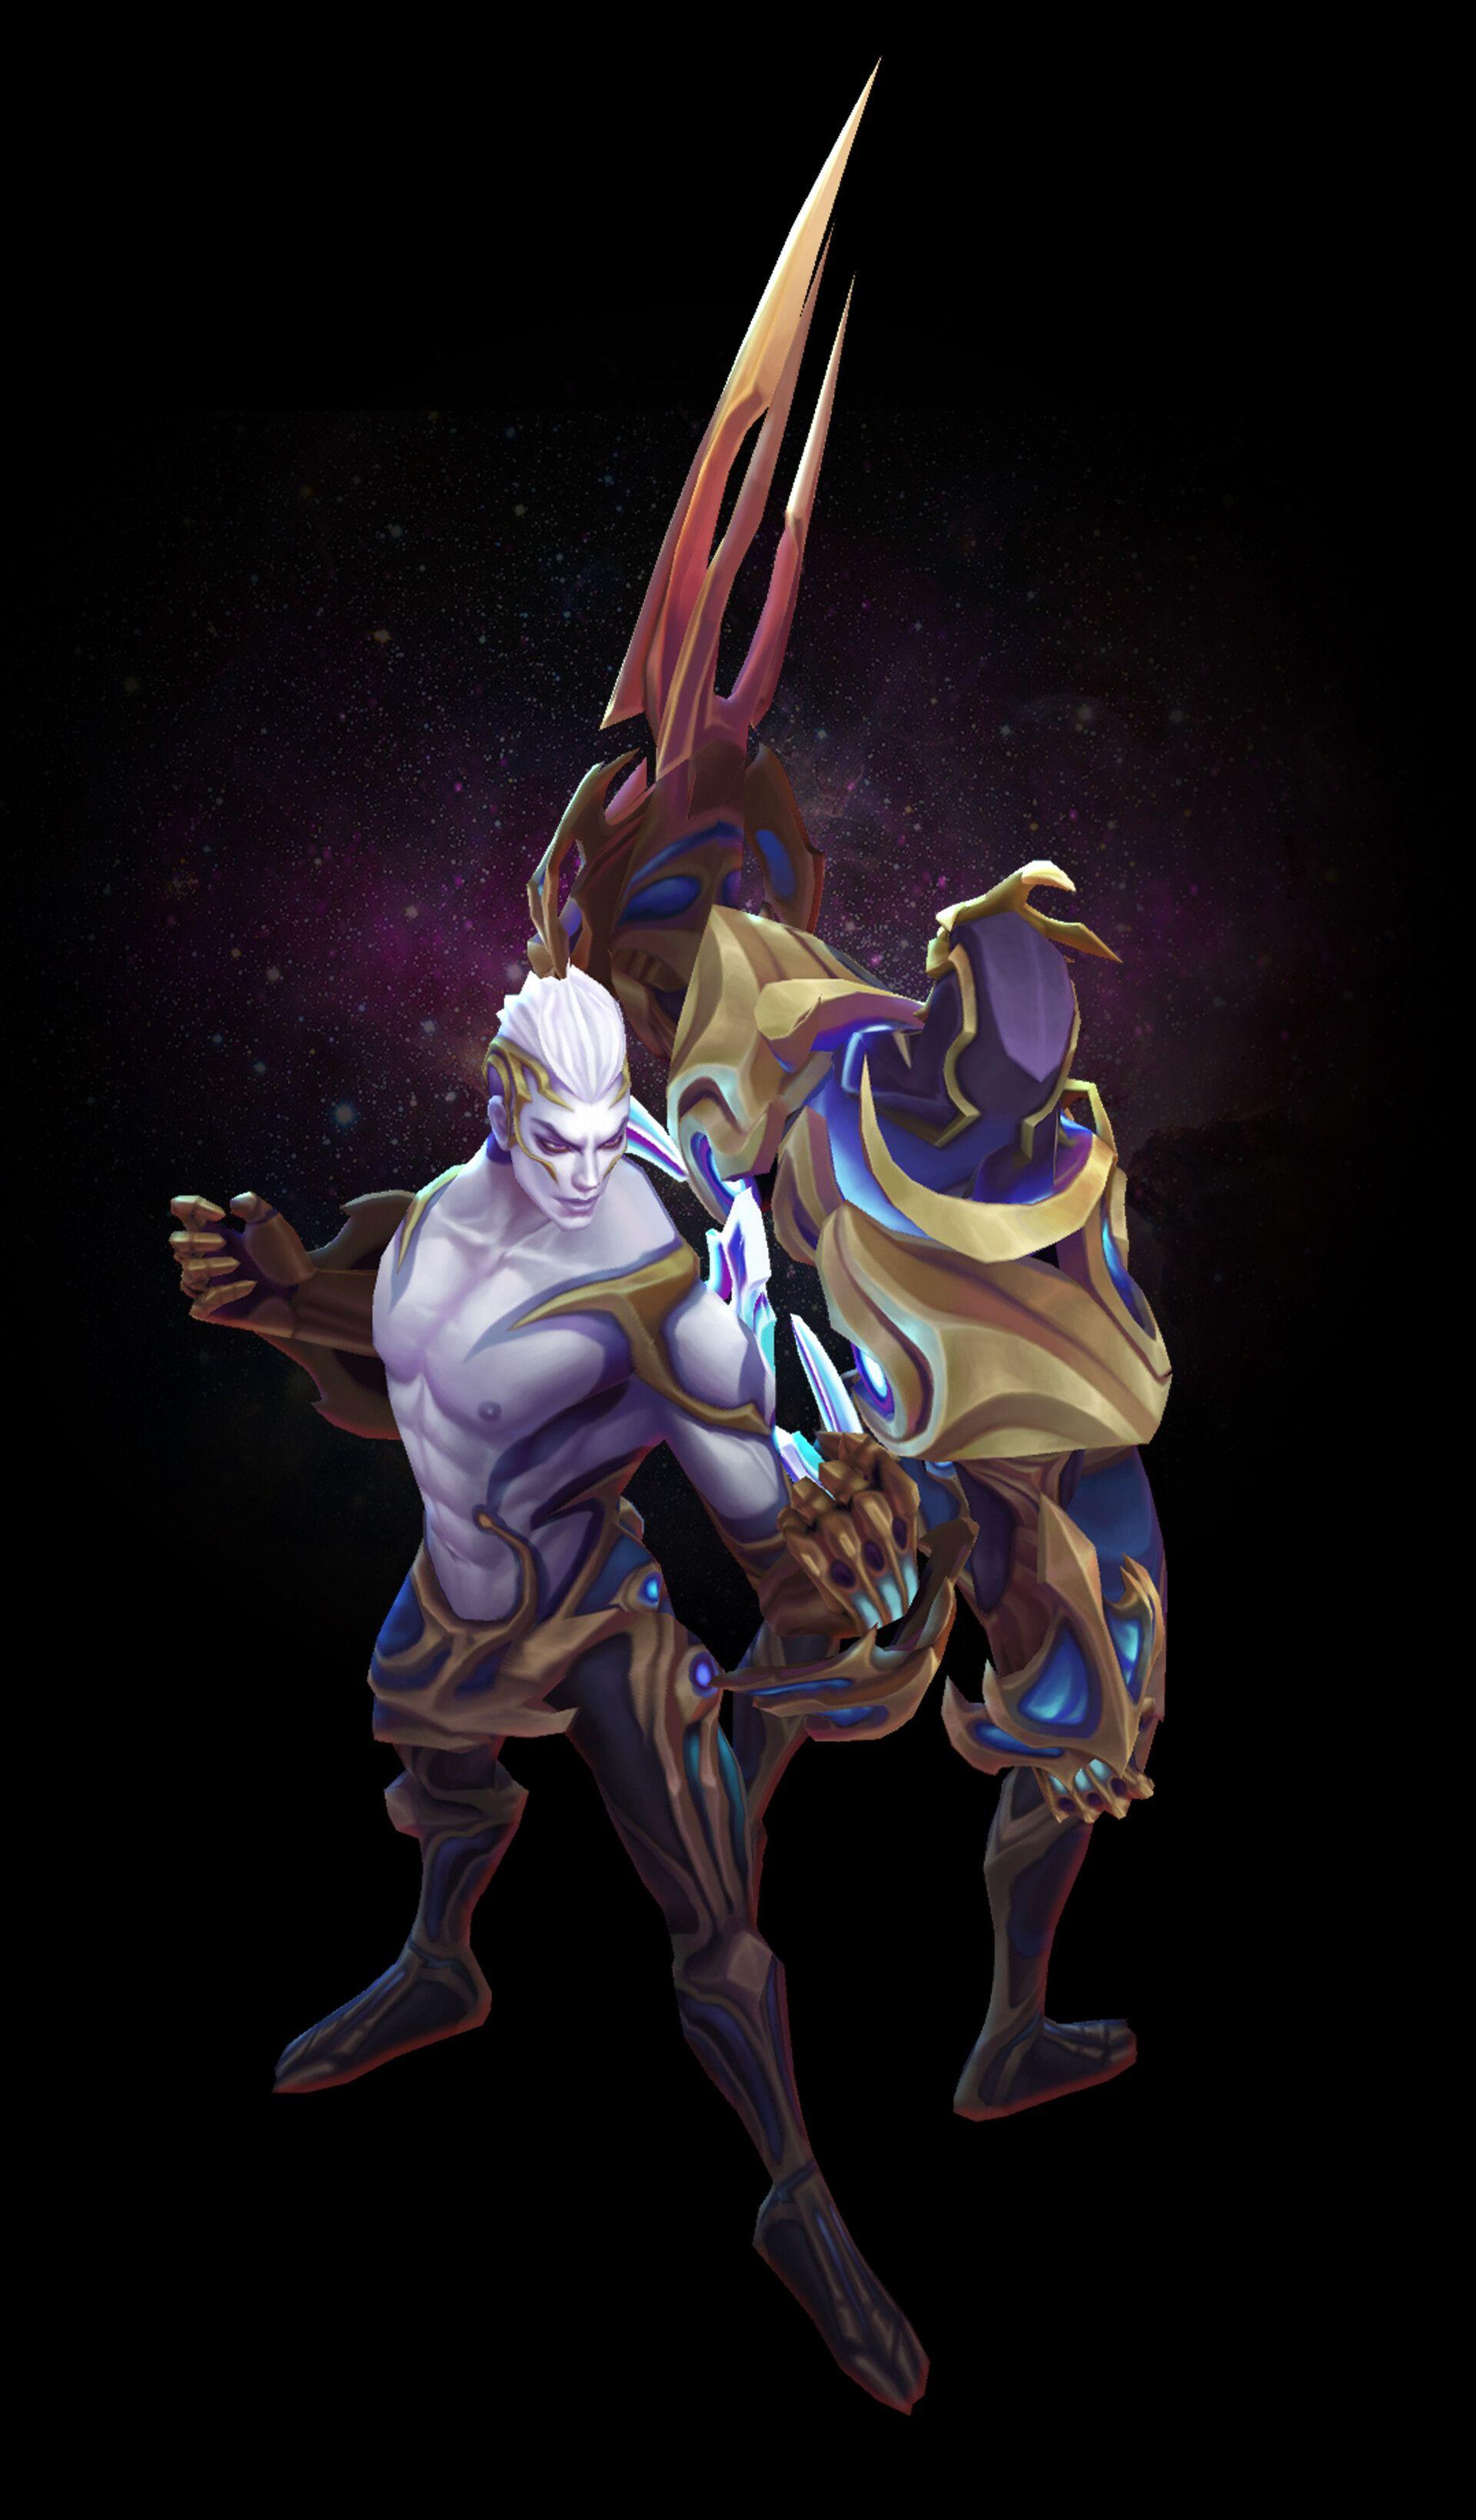 Artstation Galaxy Slayer Zed Duy Khanh Nguyen Lol League Of Legends League Of Legends Game League Of Legends Characters